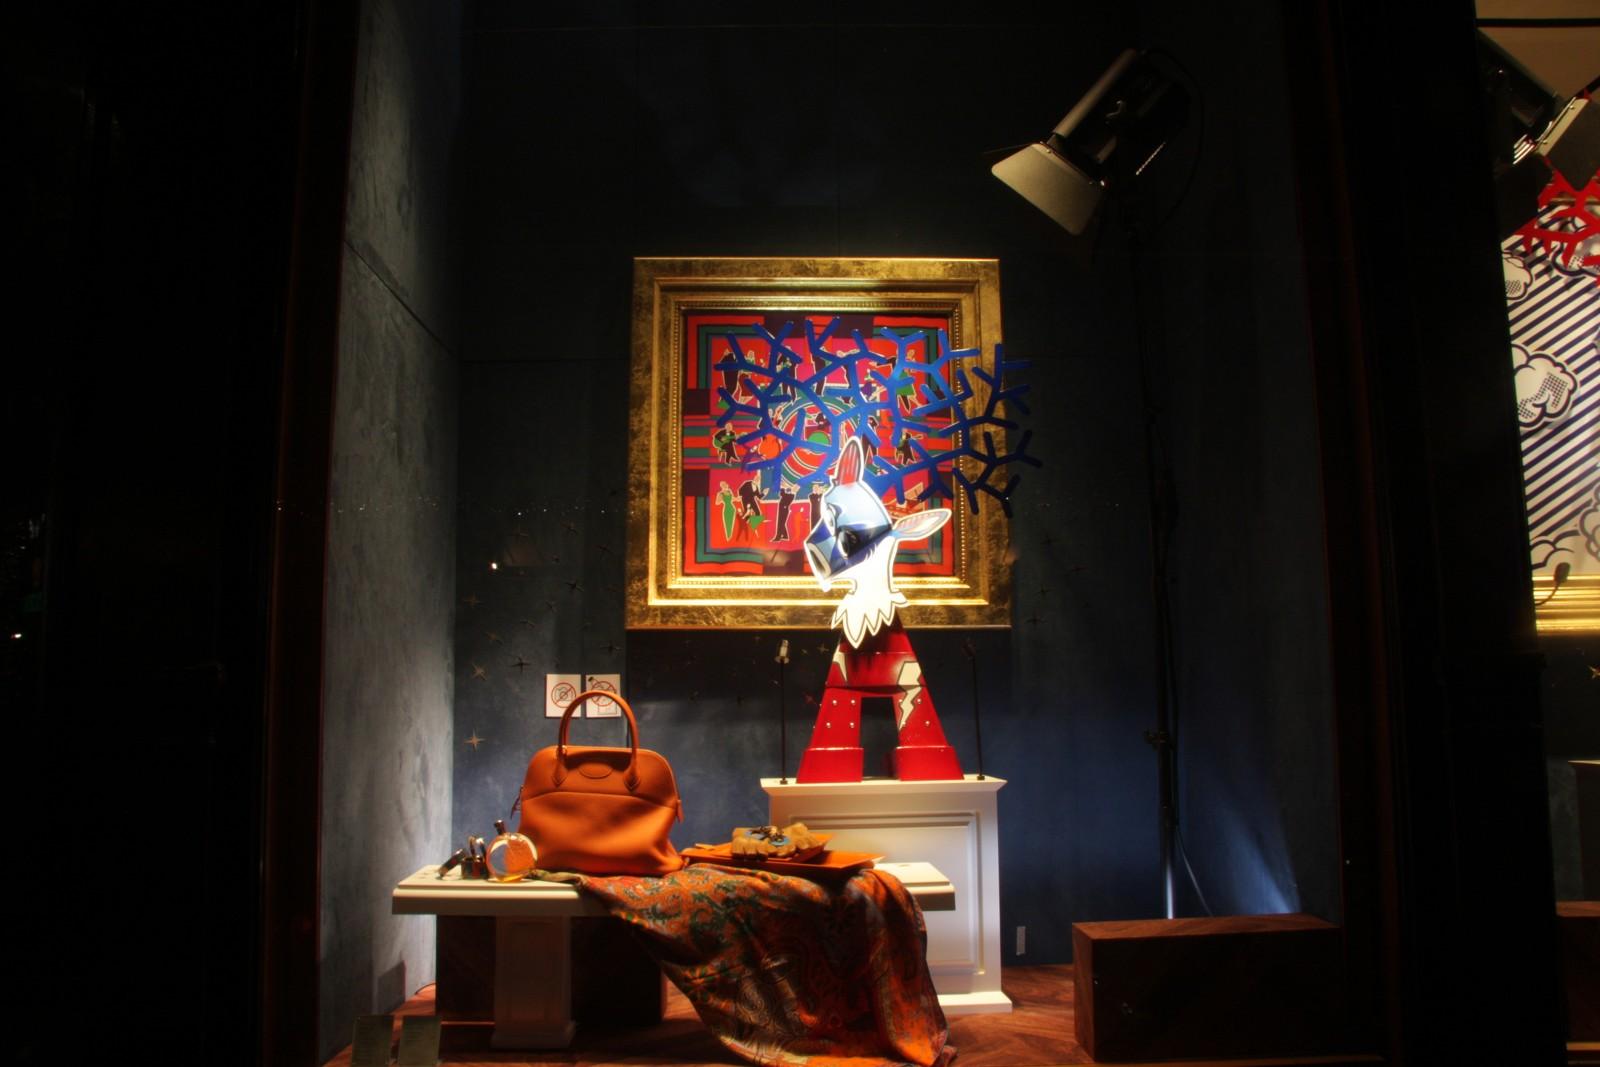 Decoration Automne Vitrine : Vitrine hermès cadres atelier nils rousset